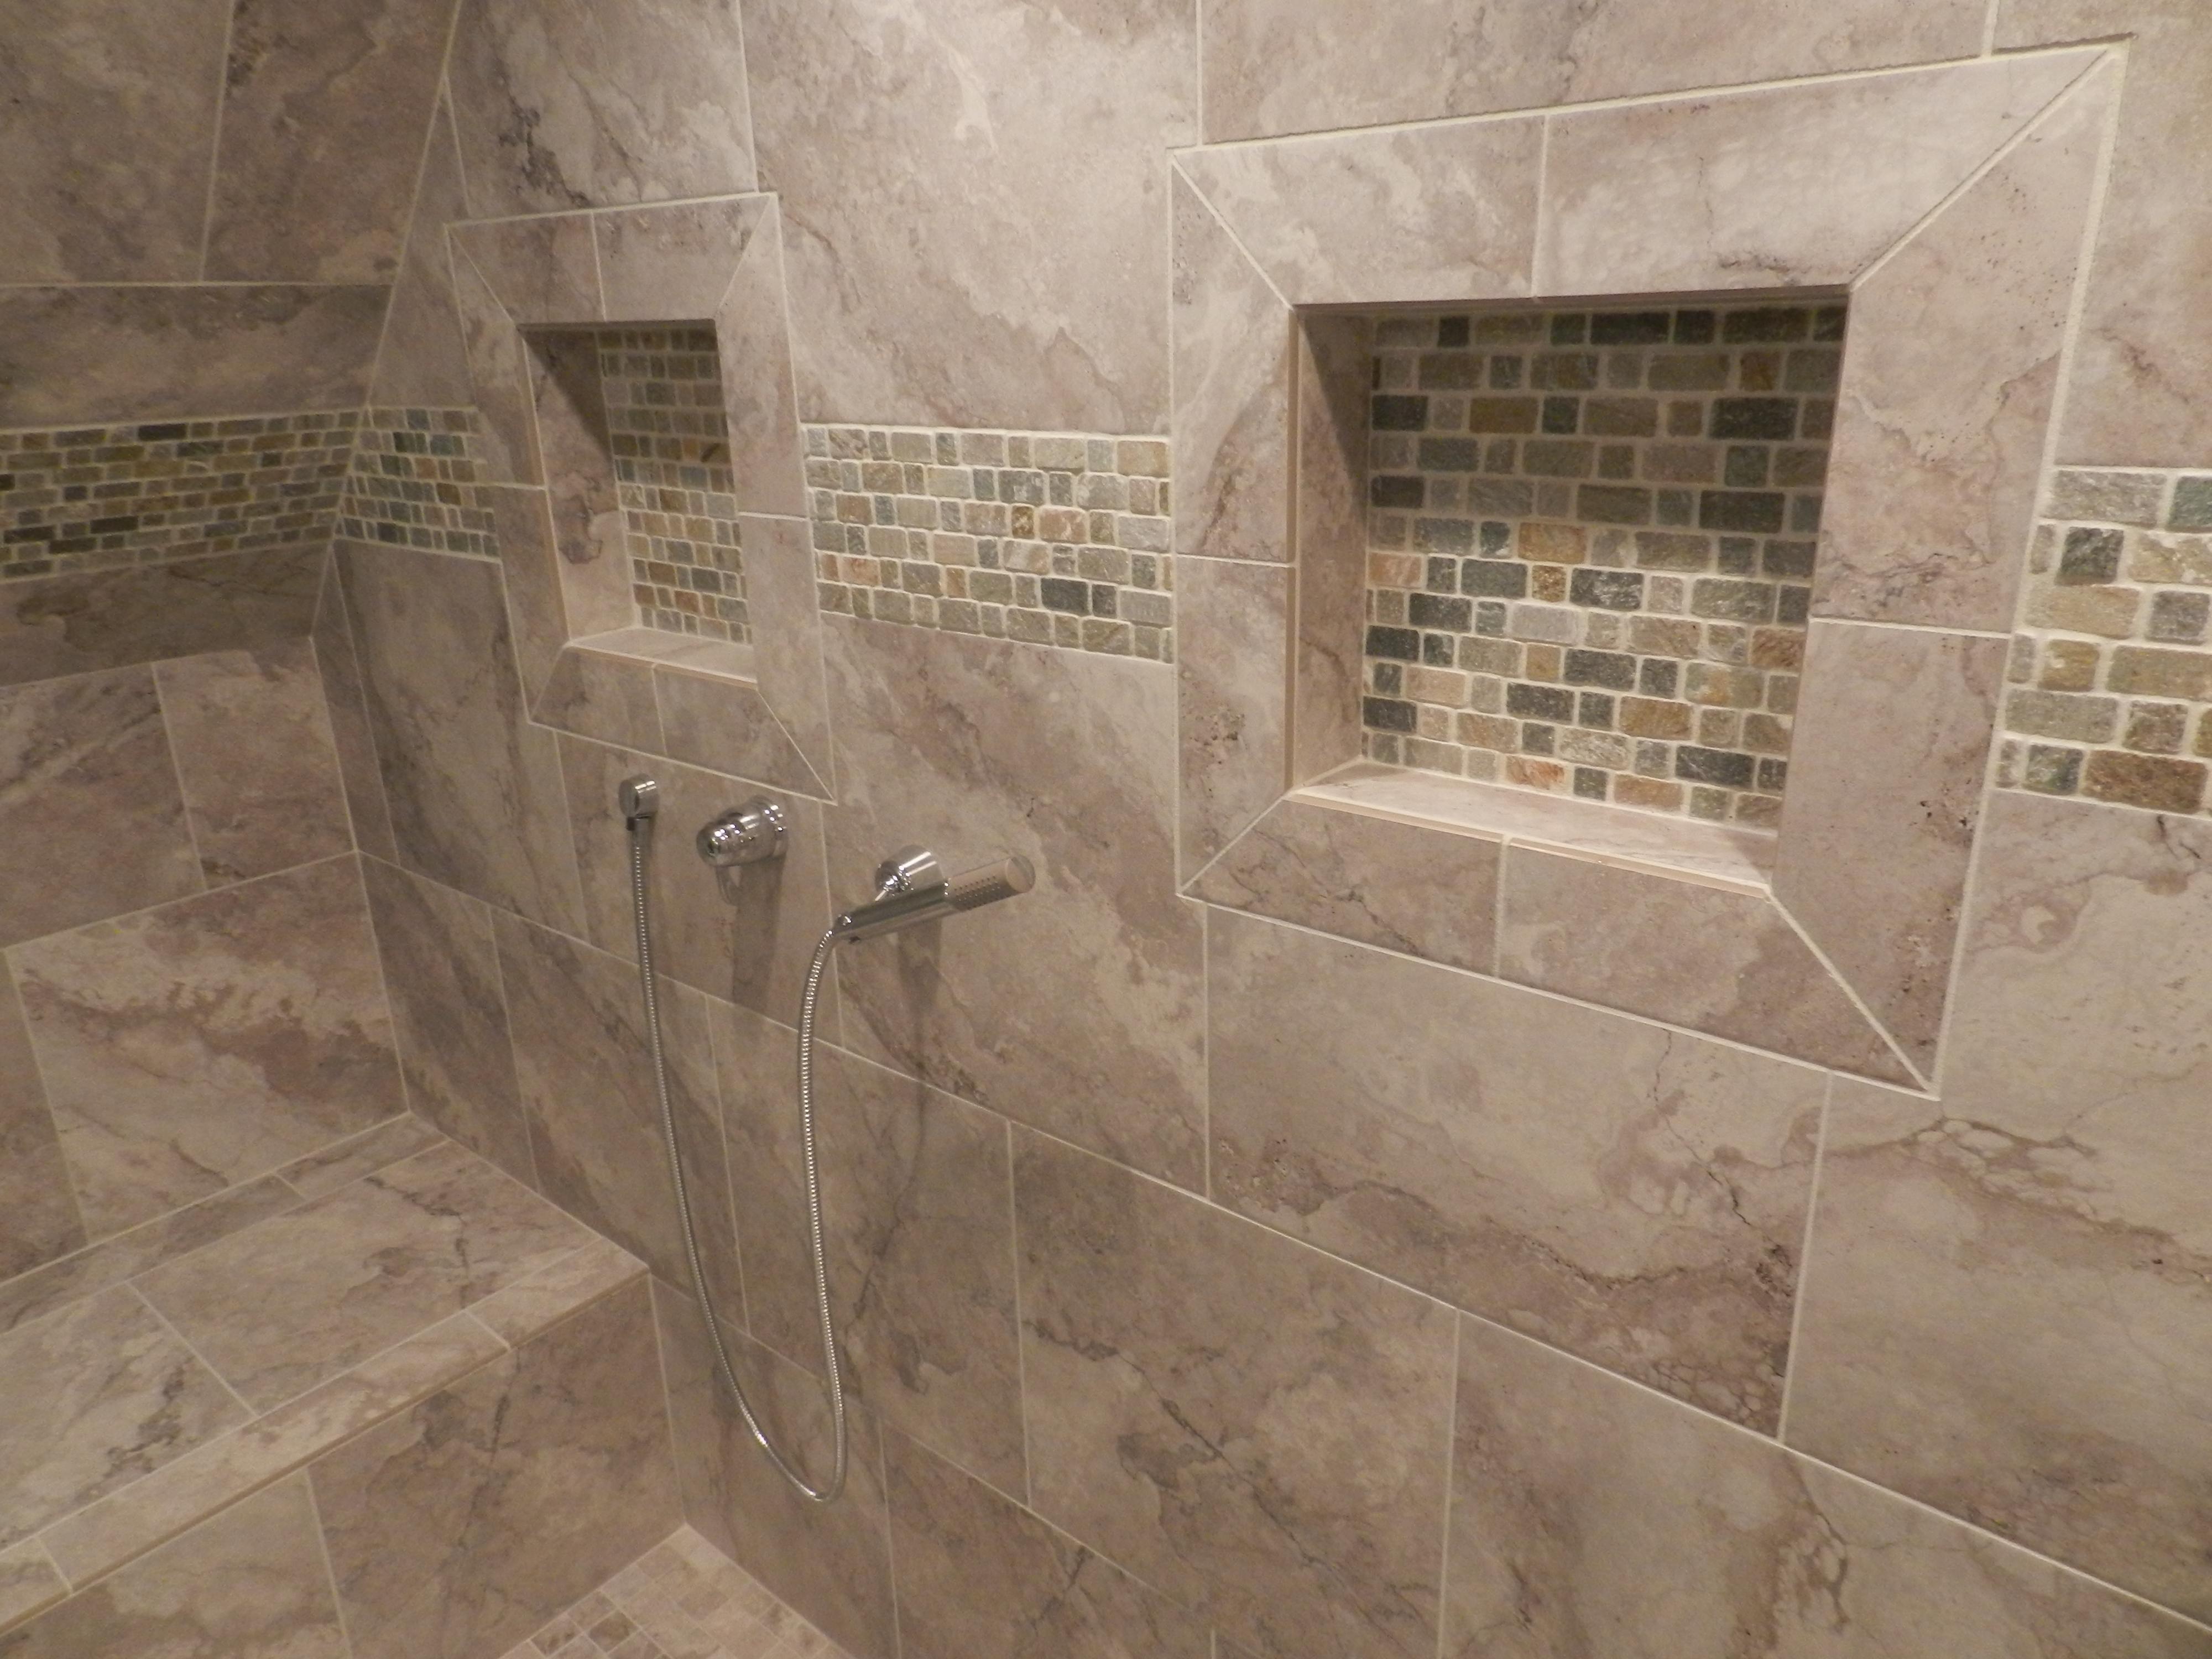 Niches-10-2014-conti-master-shower-remodel-22-.jpg